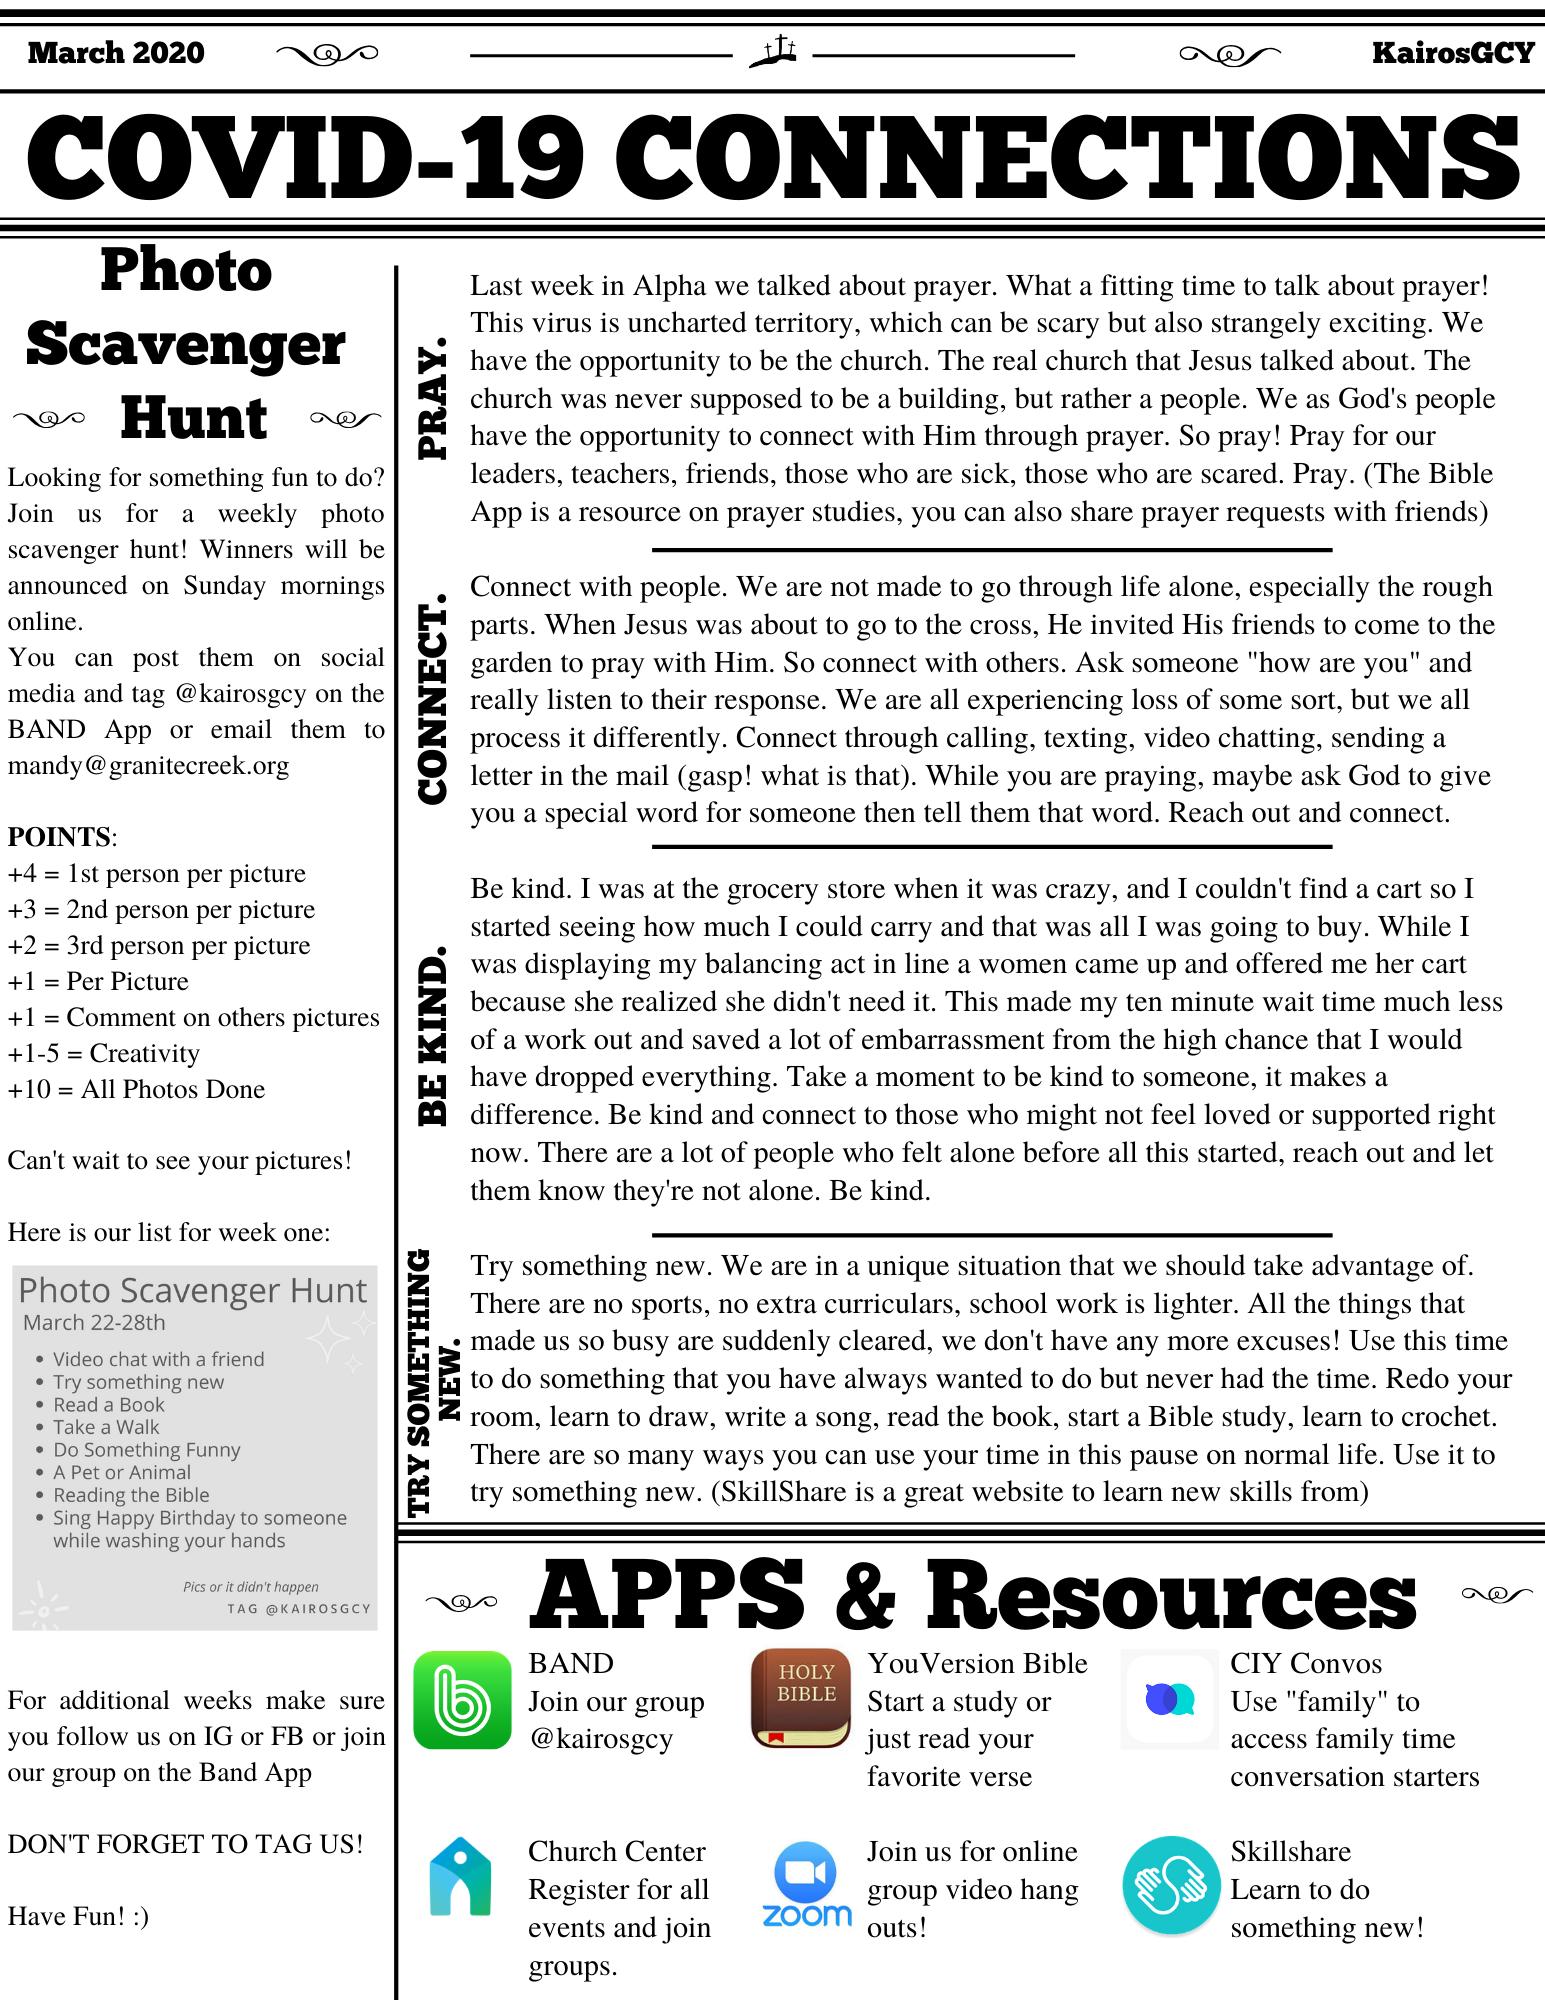 kairos-march-2020-newsletter-1_270